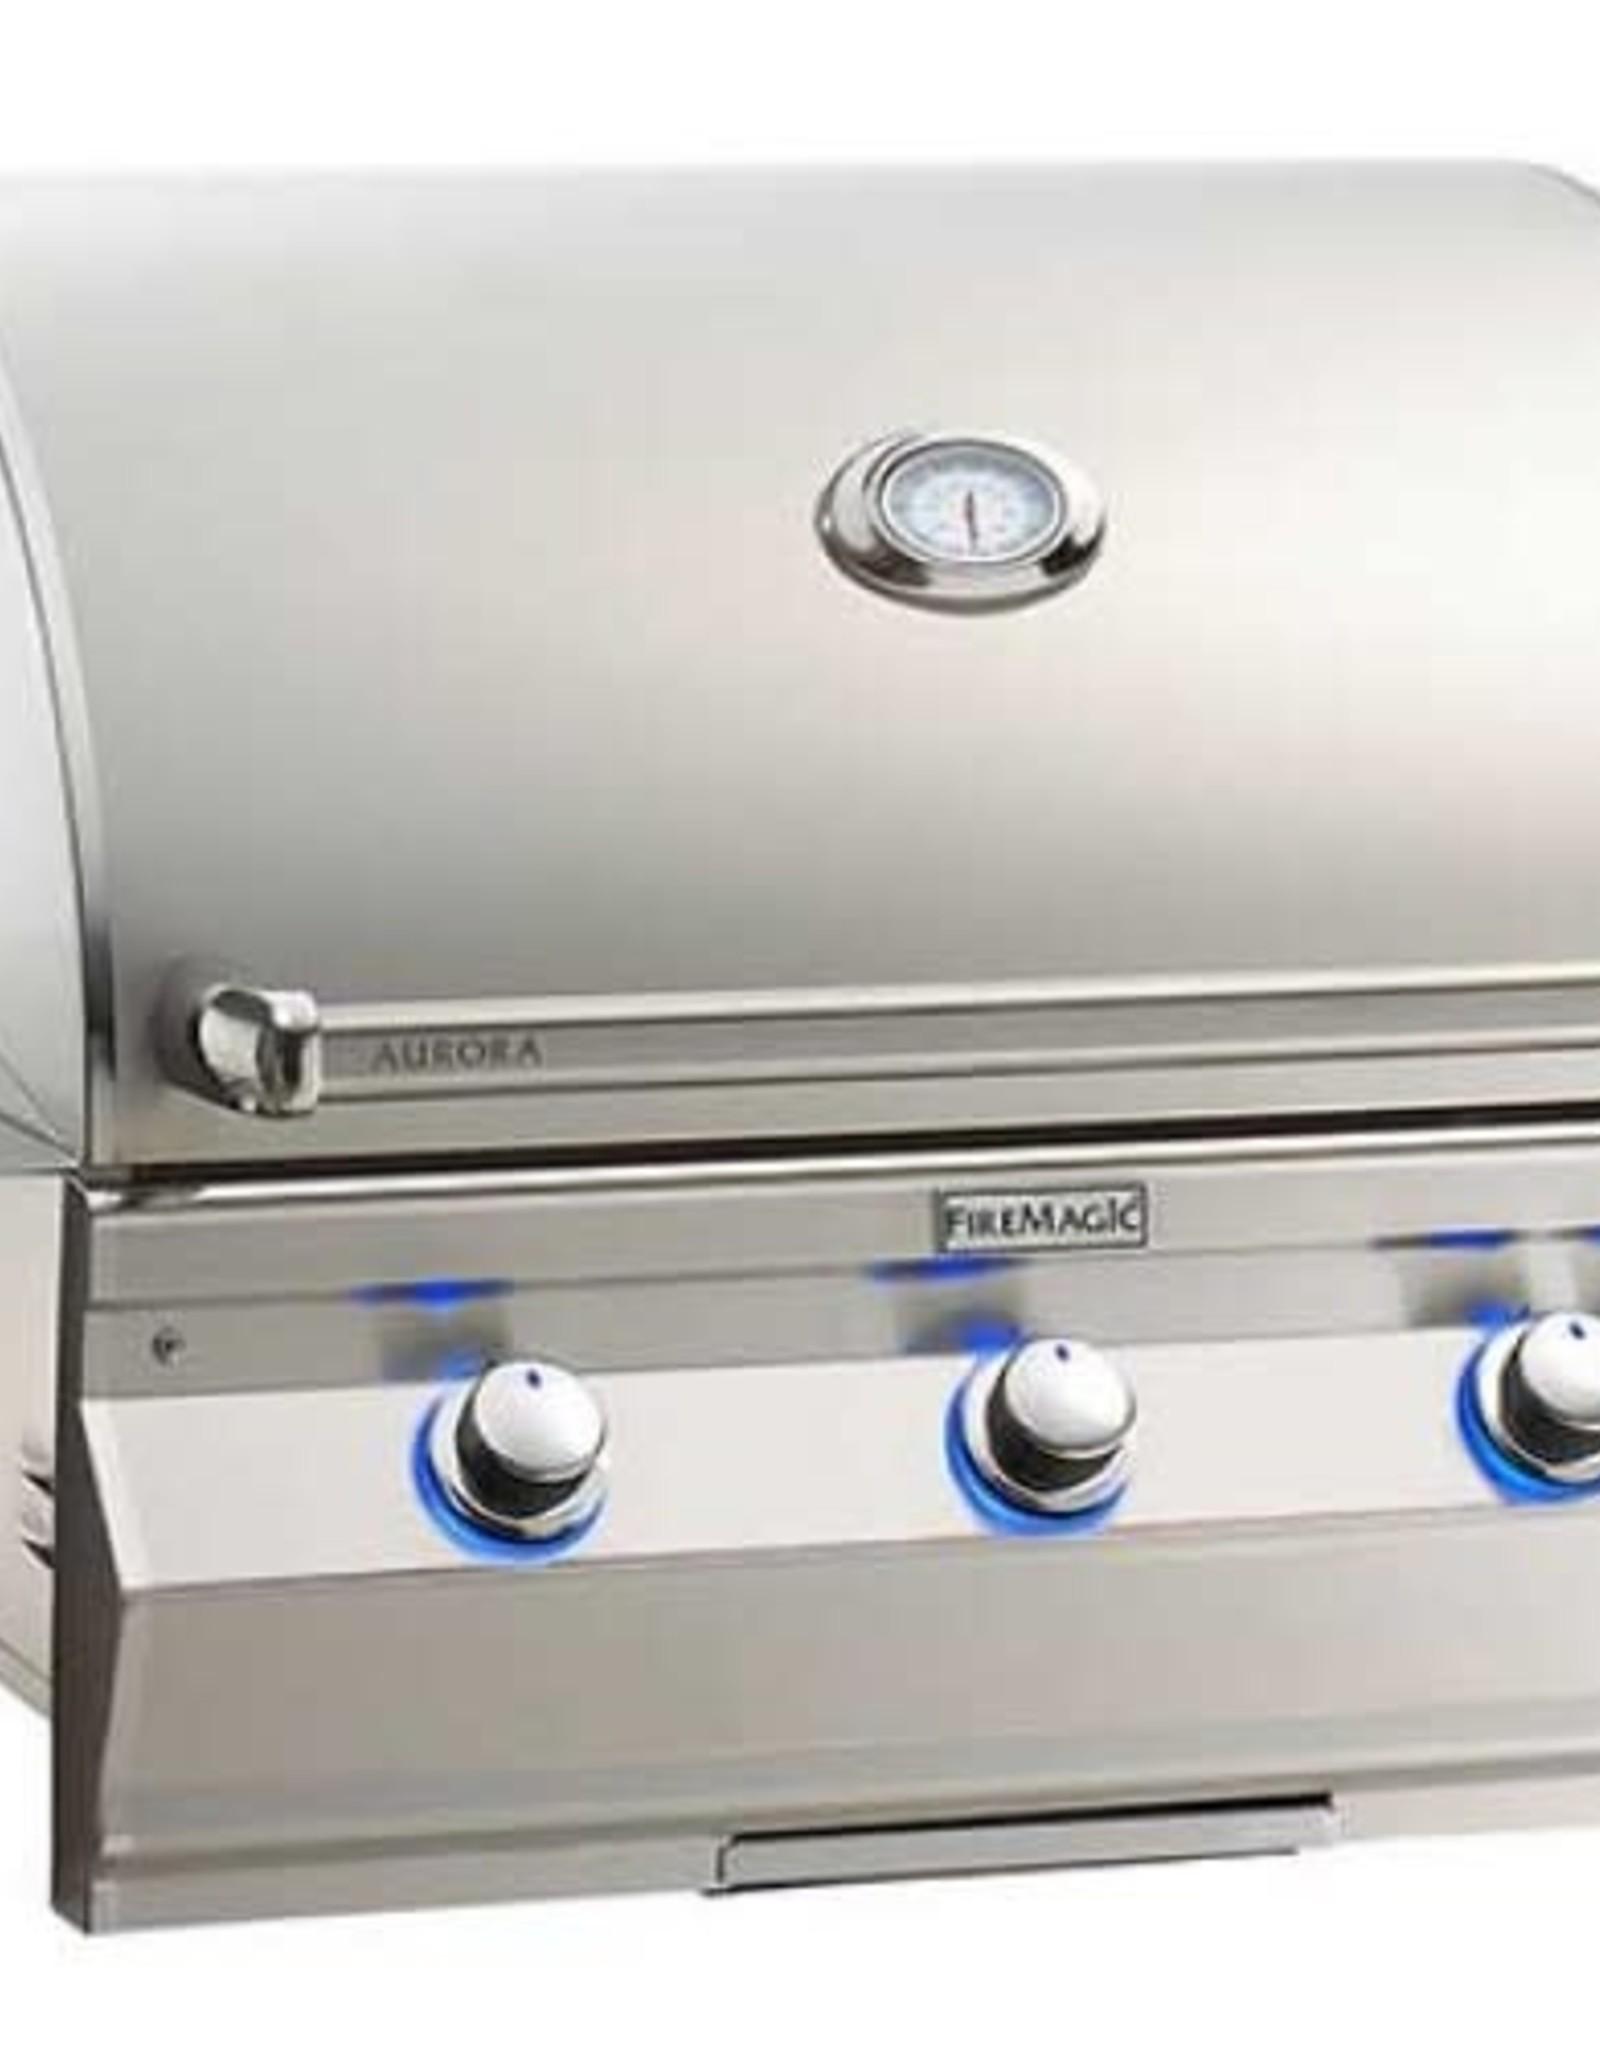 Fire Magic Fire Magic - Aurora A660i 30-inch Built-In Grill With Rotisserie